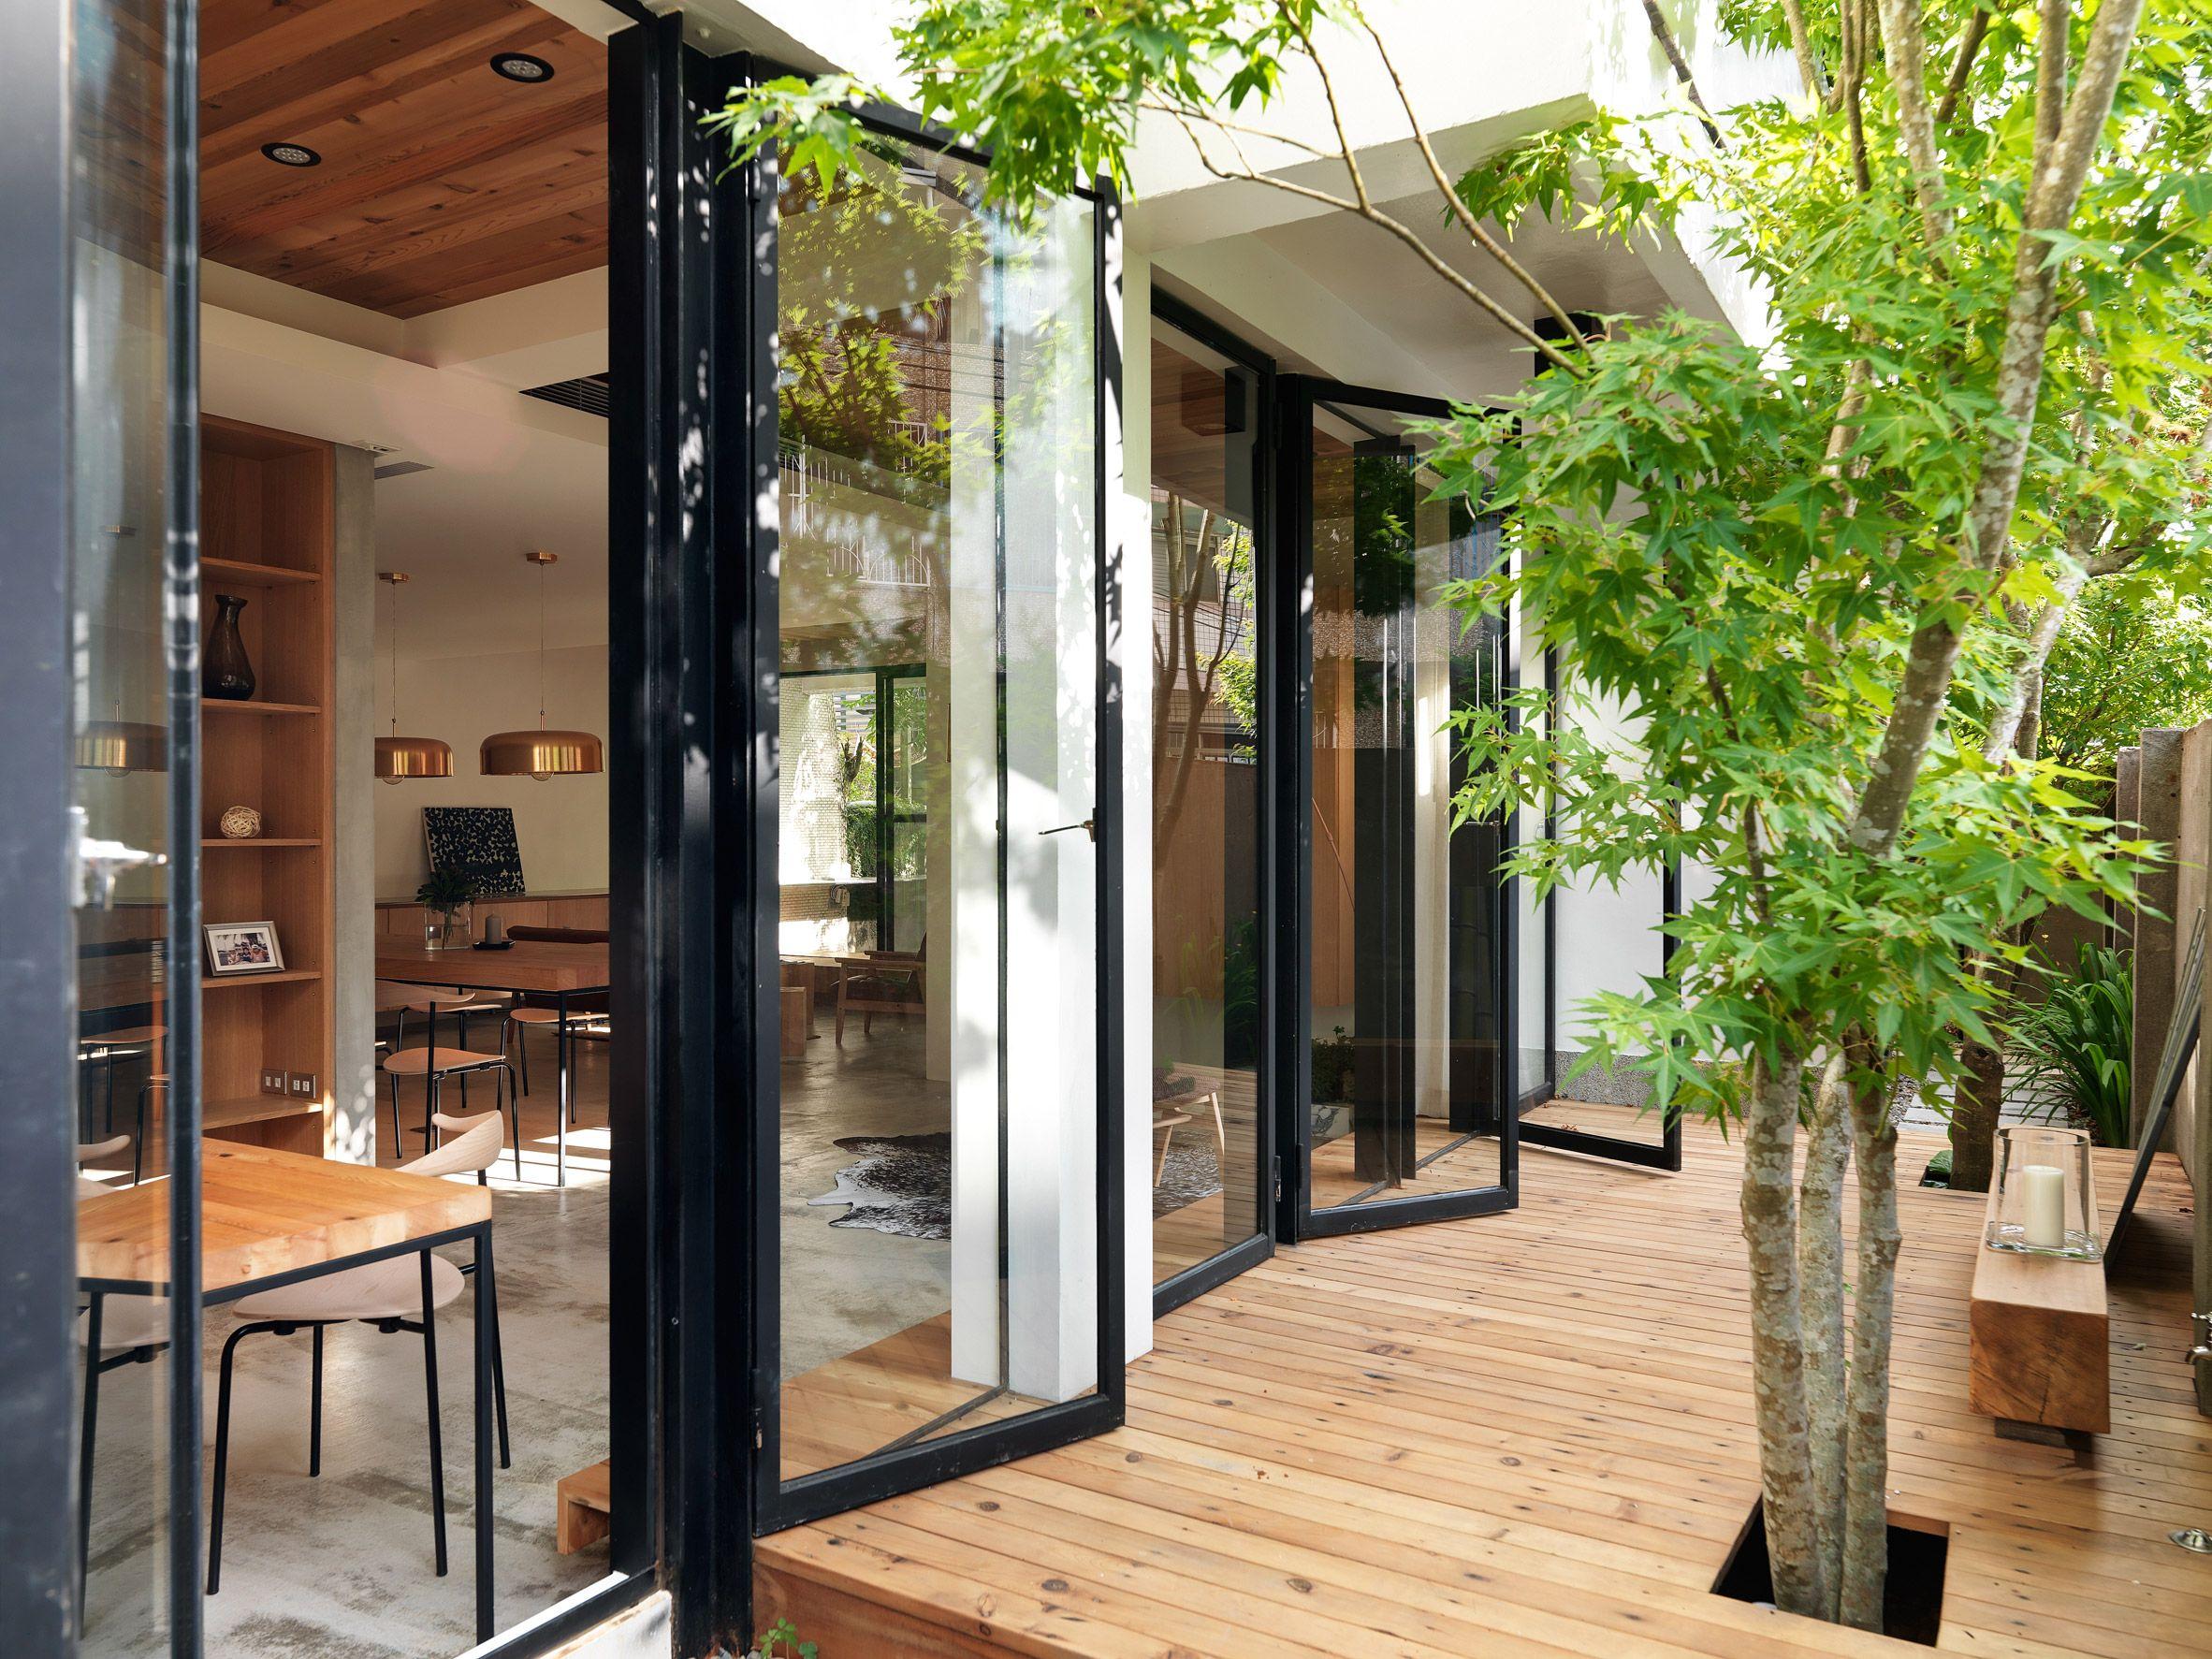 Wabi Sabi House By Soar Design 1960s House Interiror Design Minimalism Interior